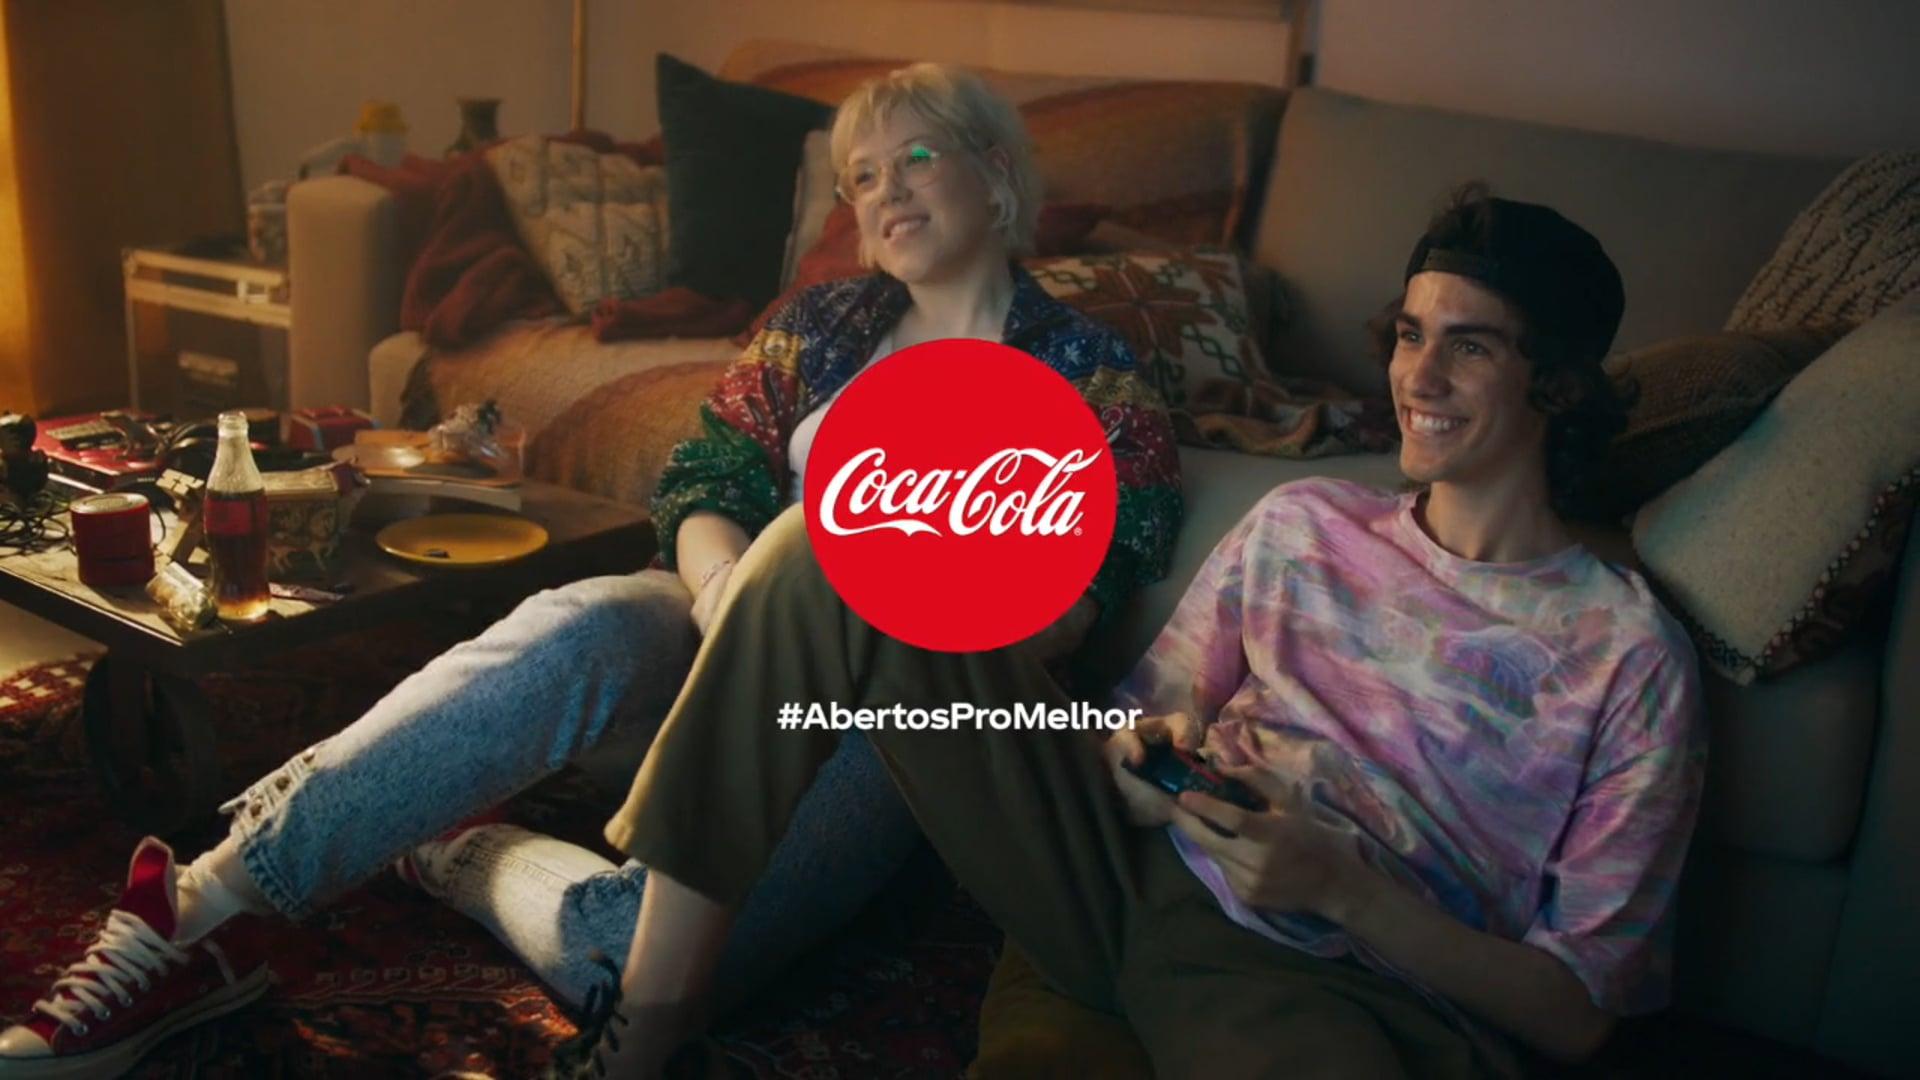 Coca-Cola | Breaks Player 2